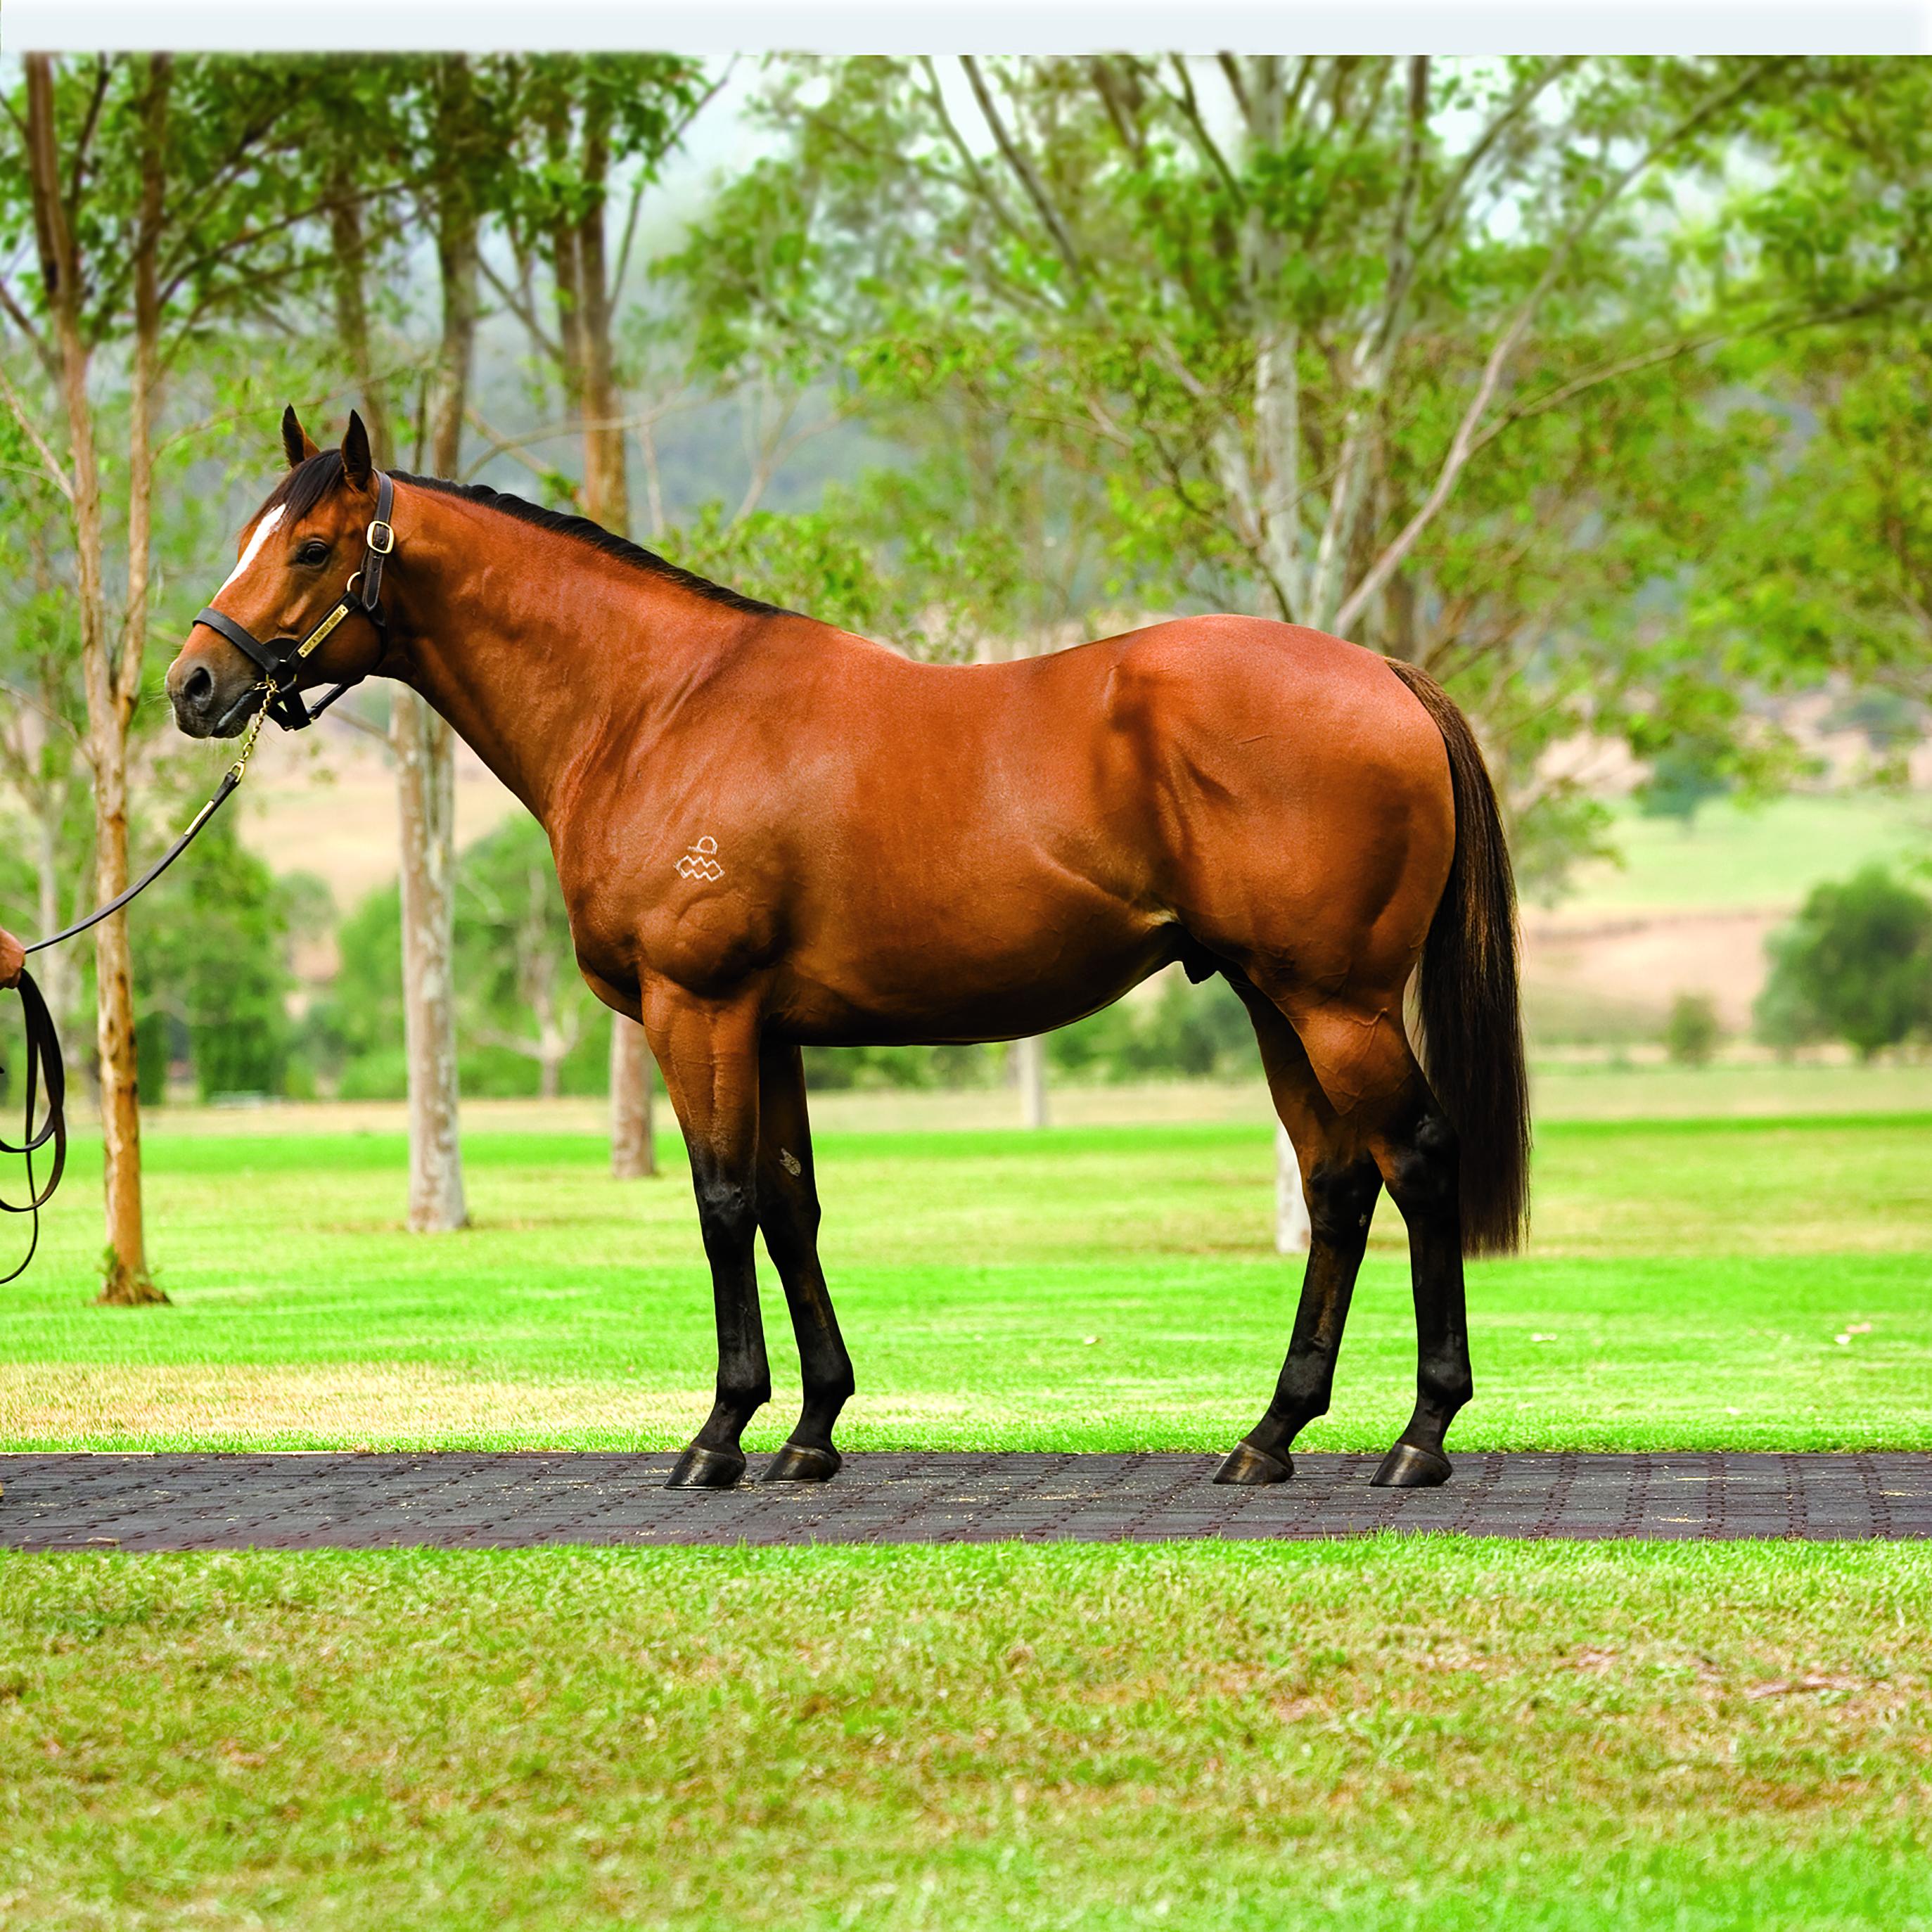 https://www.stallions.com.au/wp-content/uploads/2020/08/Not-a-Single-Doubt_2015.jpg